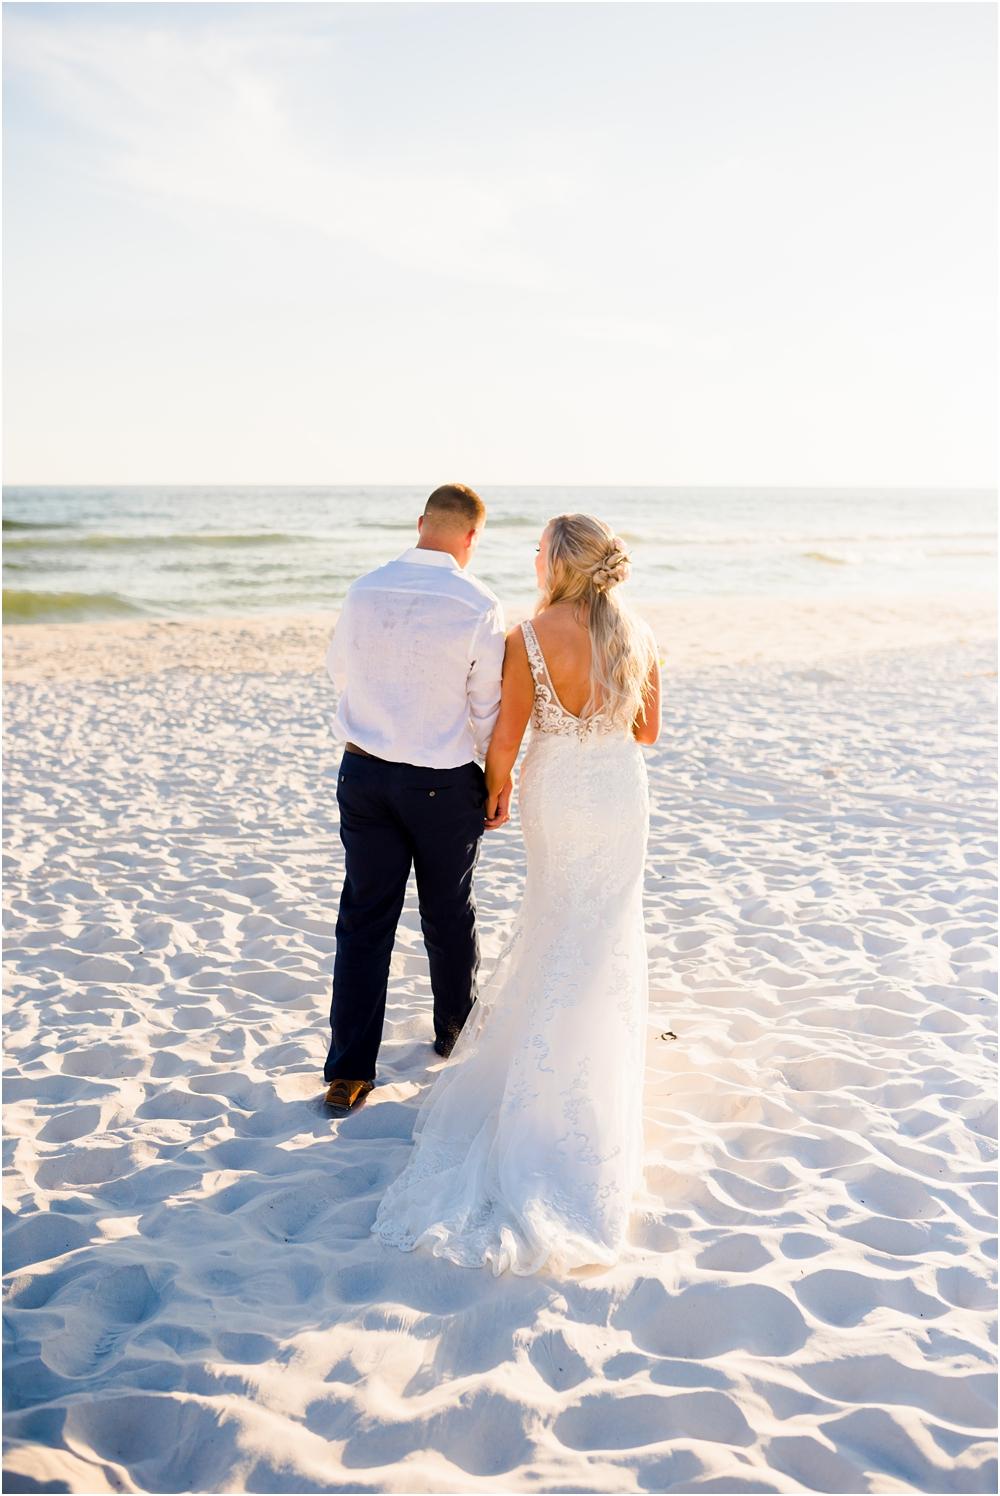 mcglothlin-wedding-kiersten-stevenson-photography-30a-panama-city-beach-dothan-tallahassee-(94-of-145).jpg